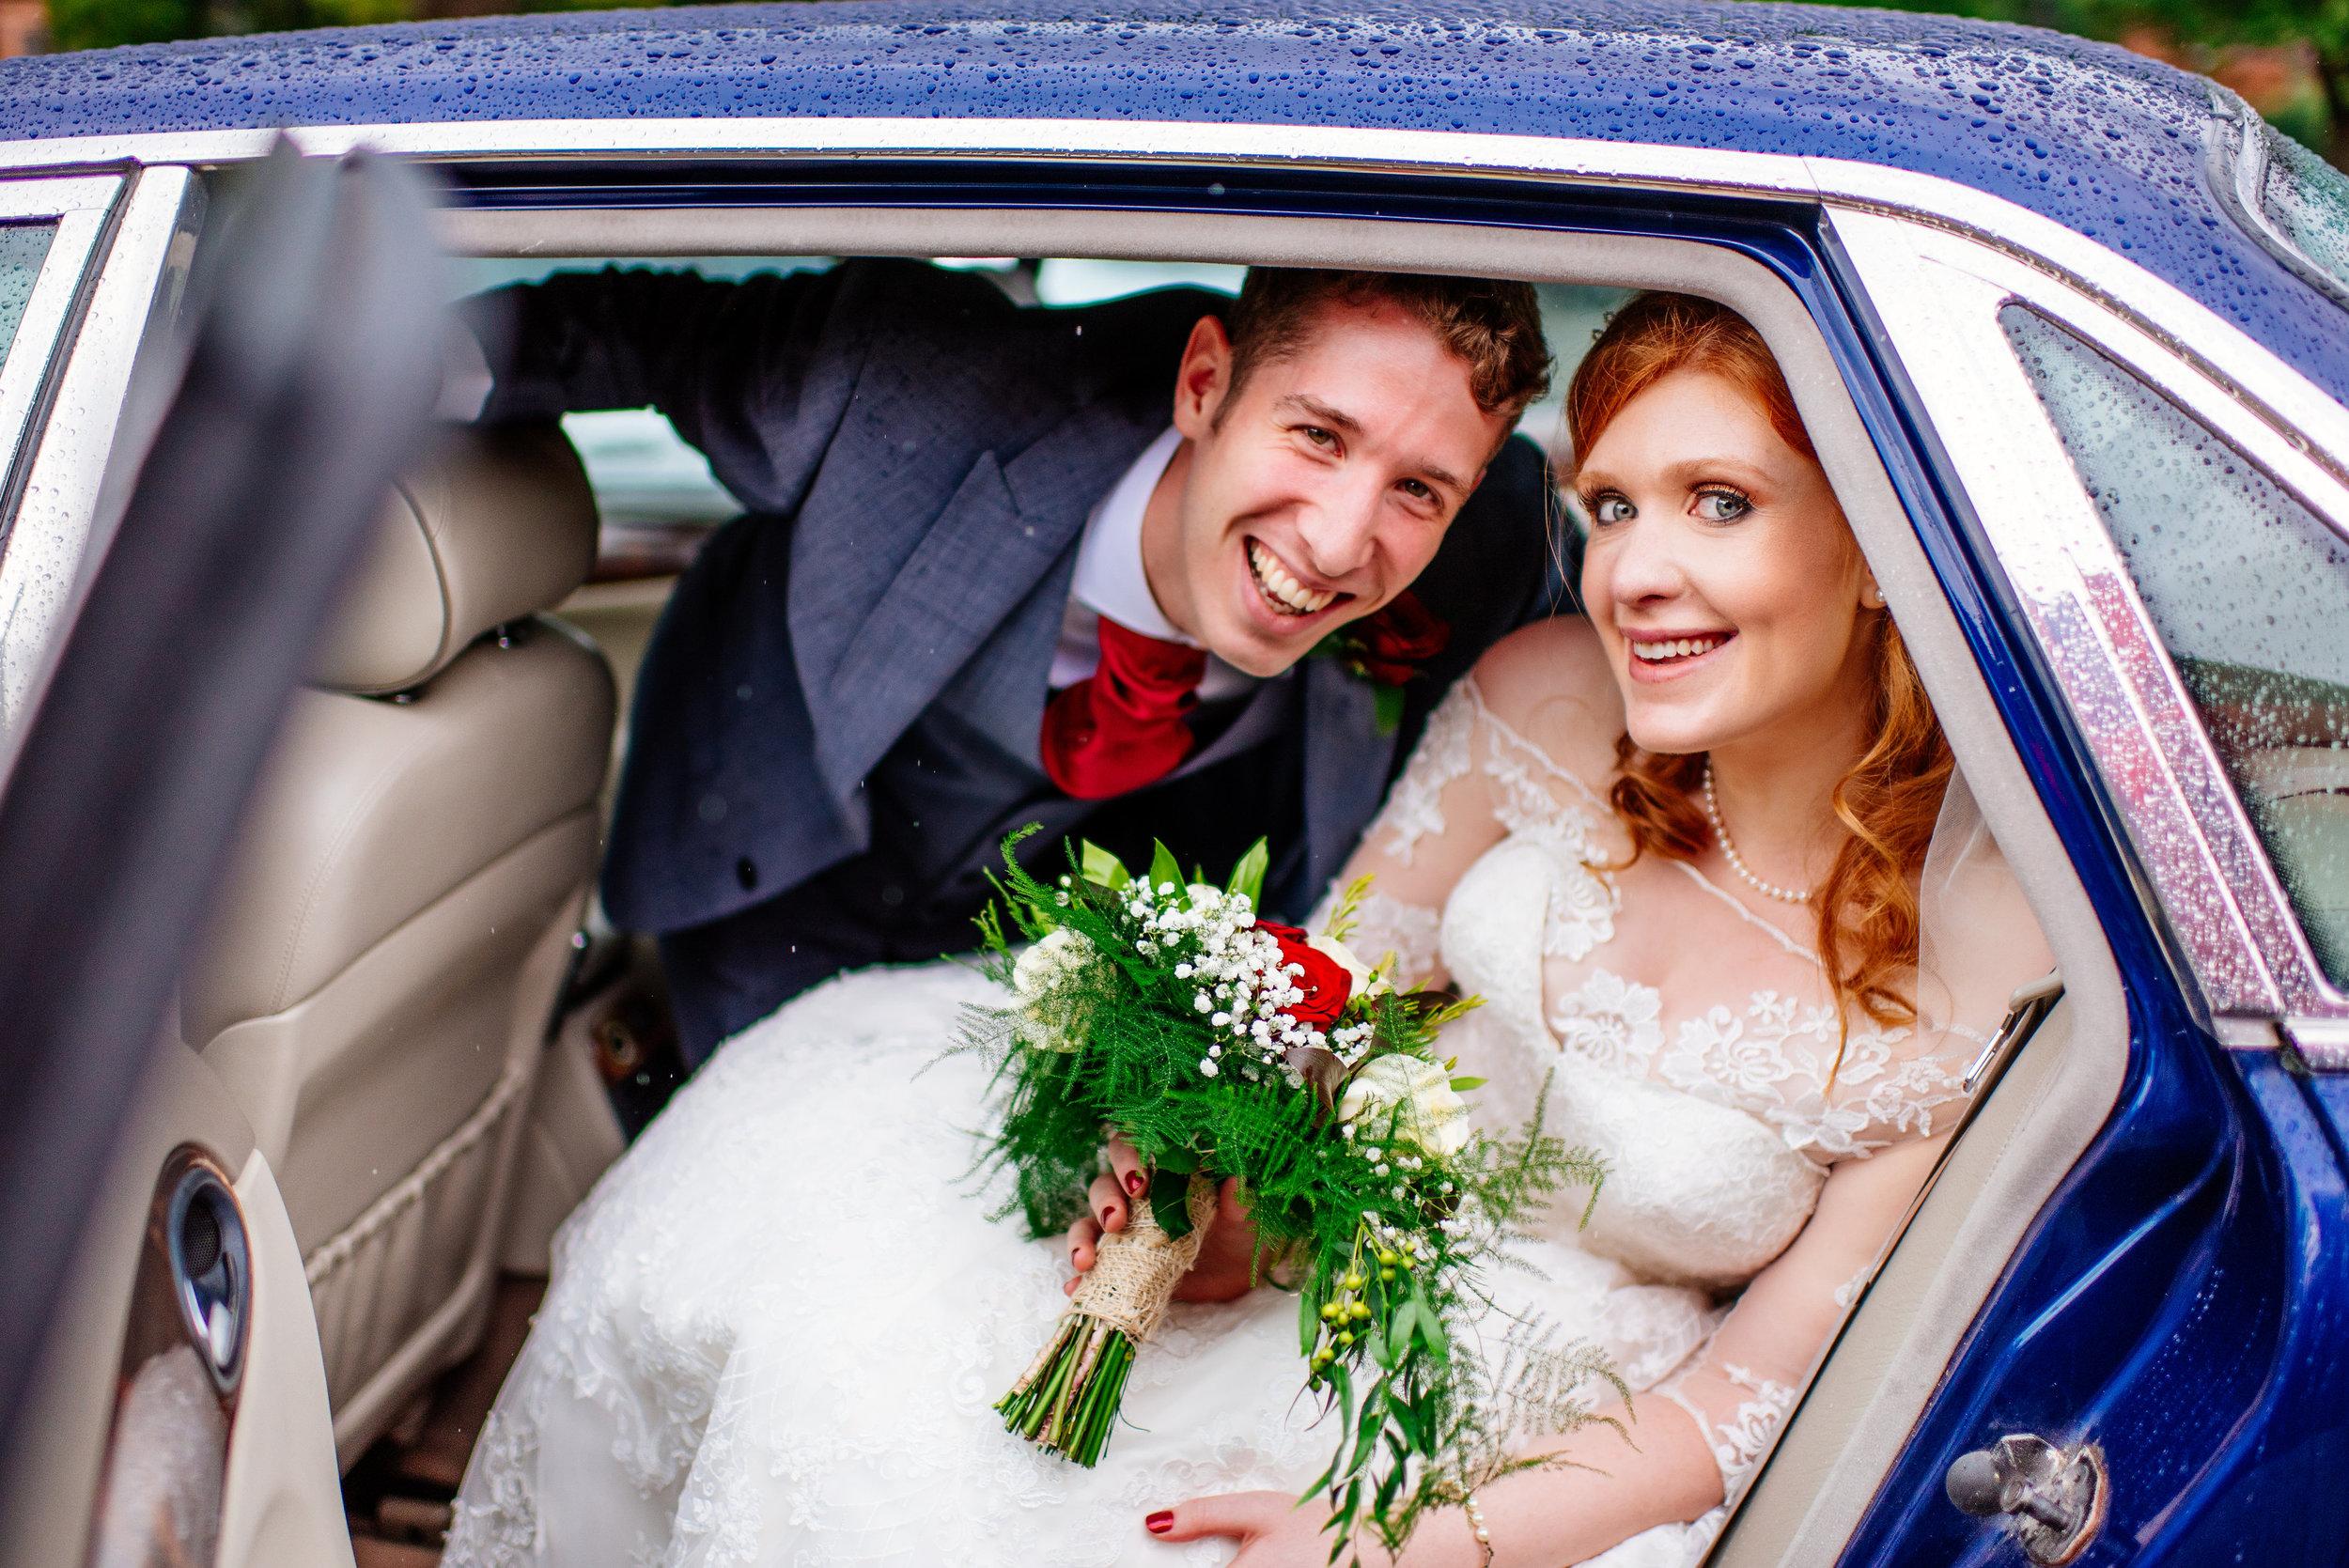 134 New Hall Hotel and Spa Birmingham Warwickshire Wedding Photography Bride Groom.jpg